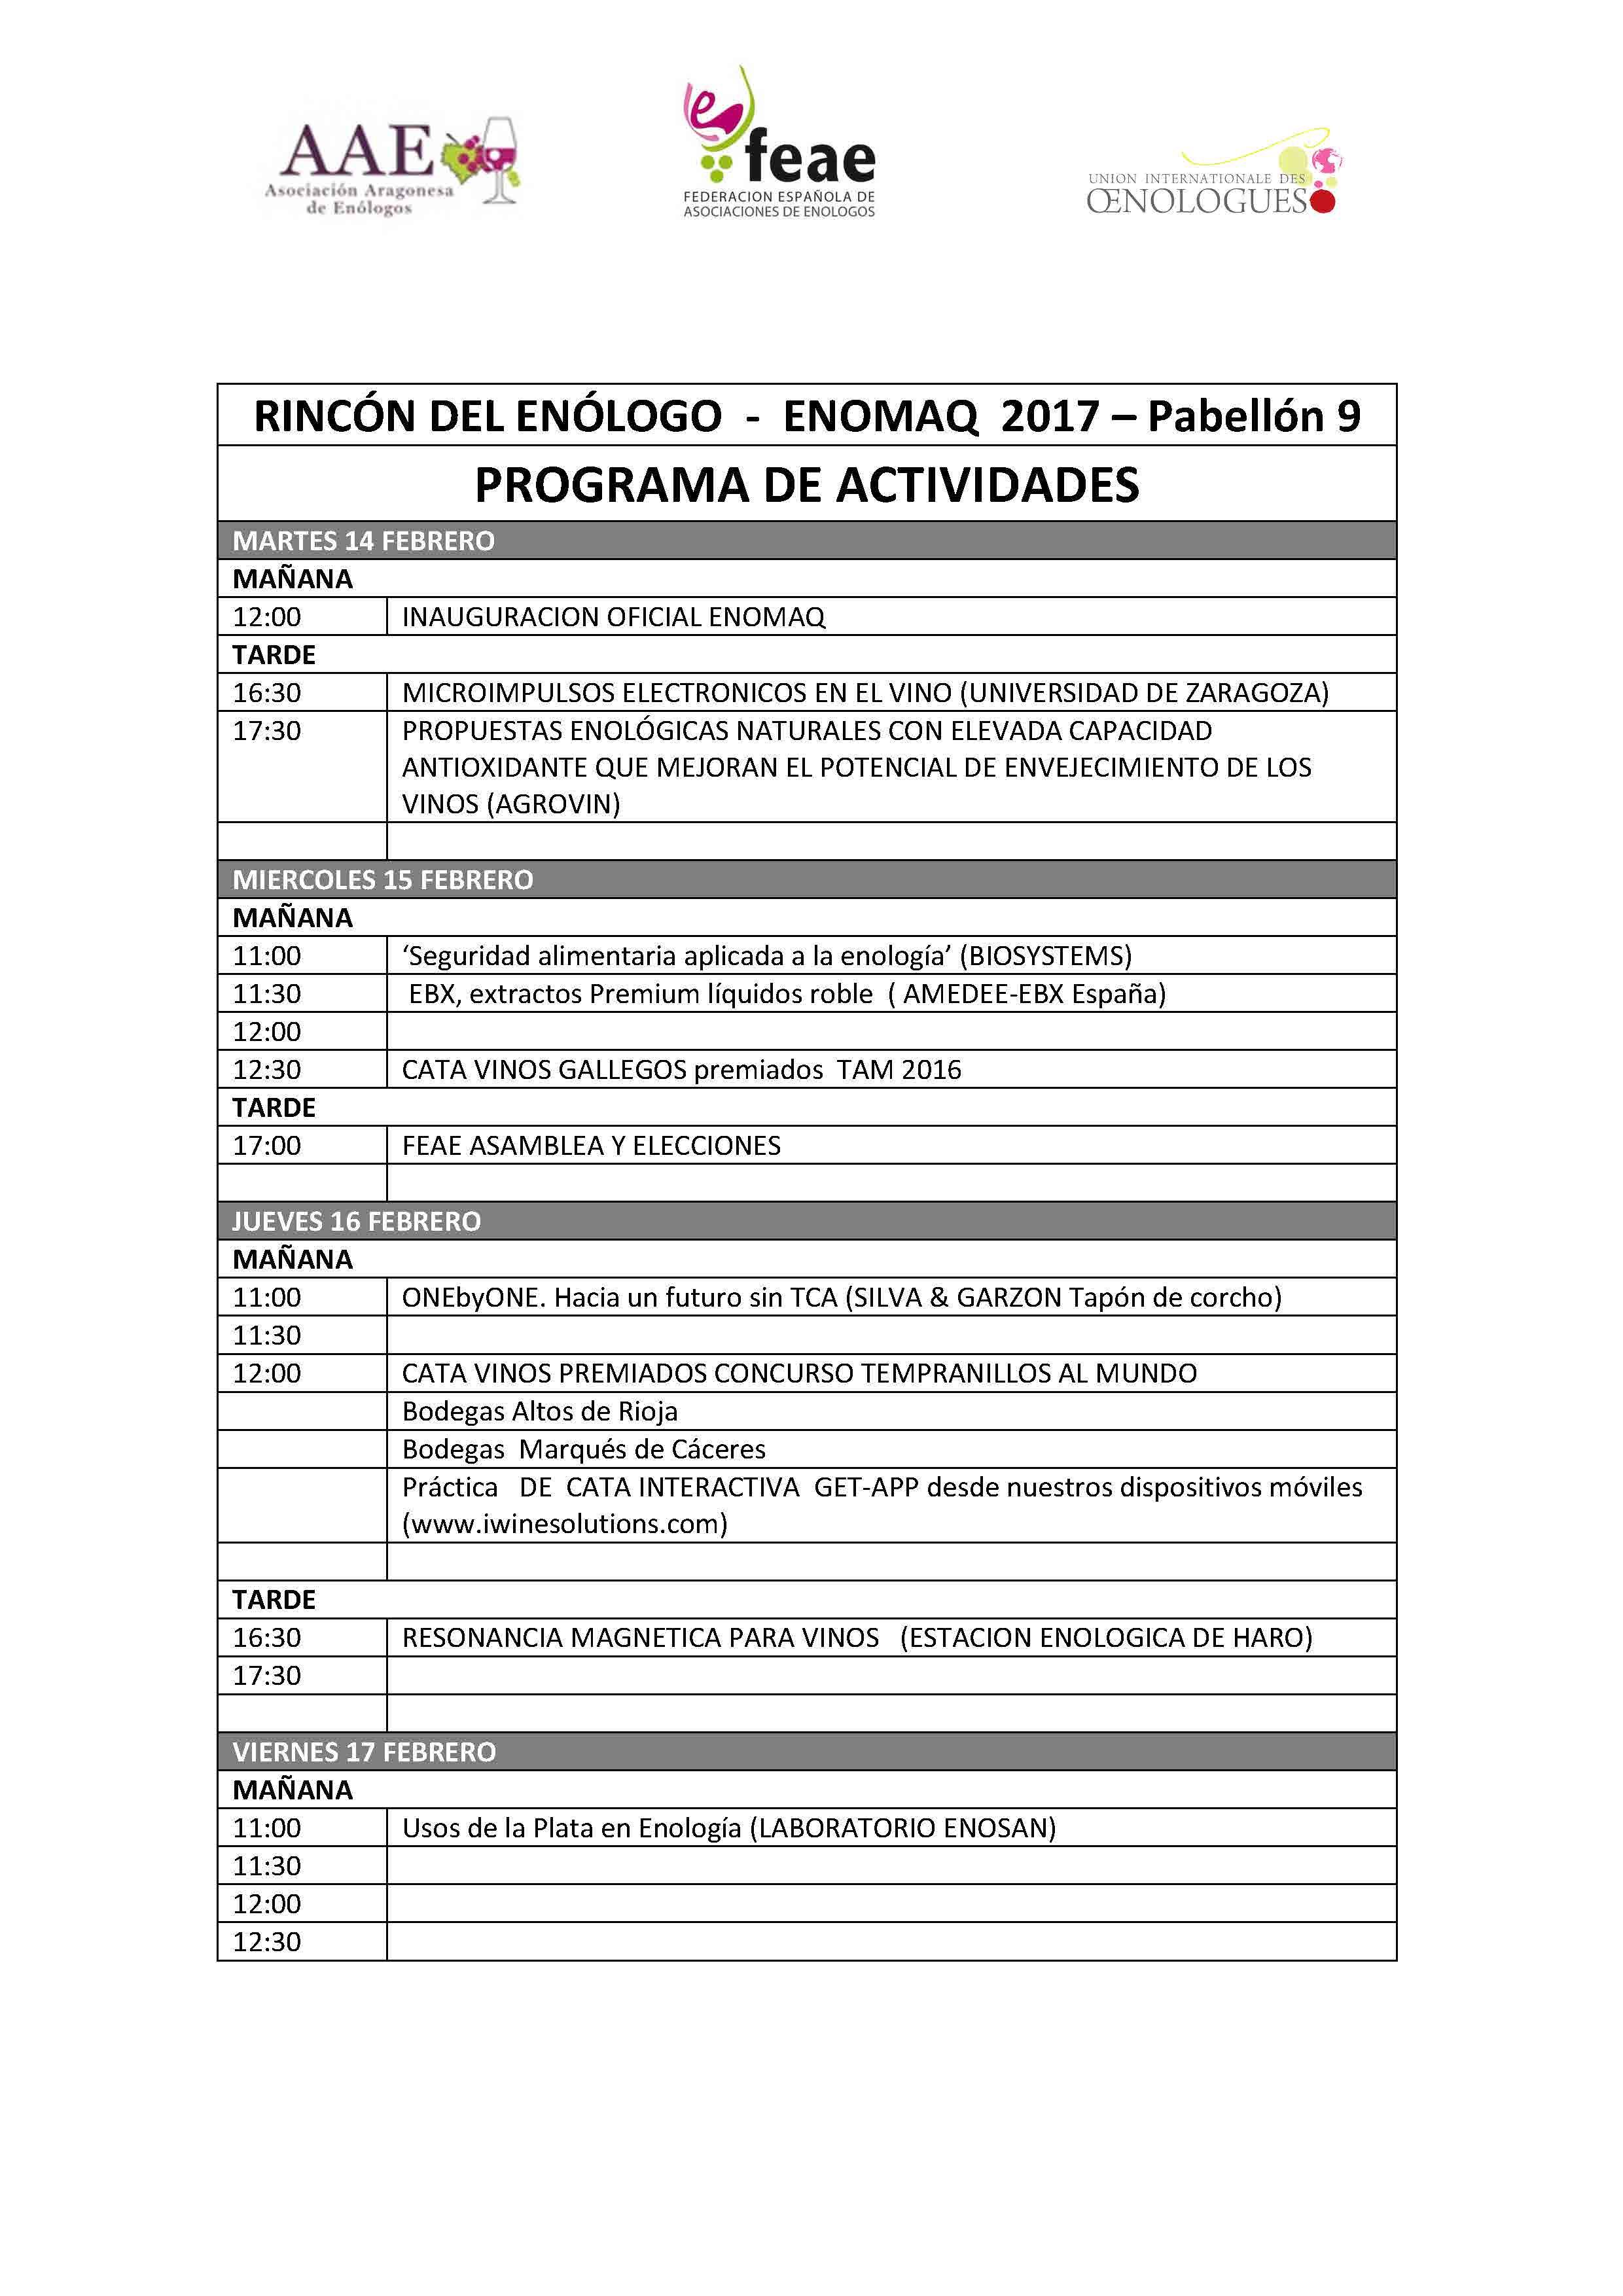 rincon-del-enologo-enomaq-2017